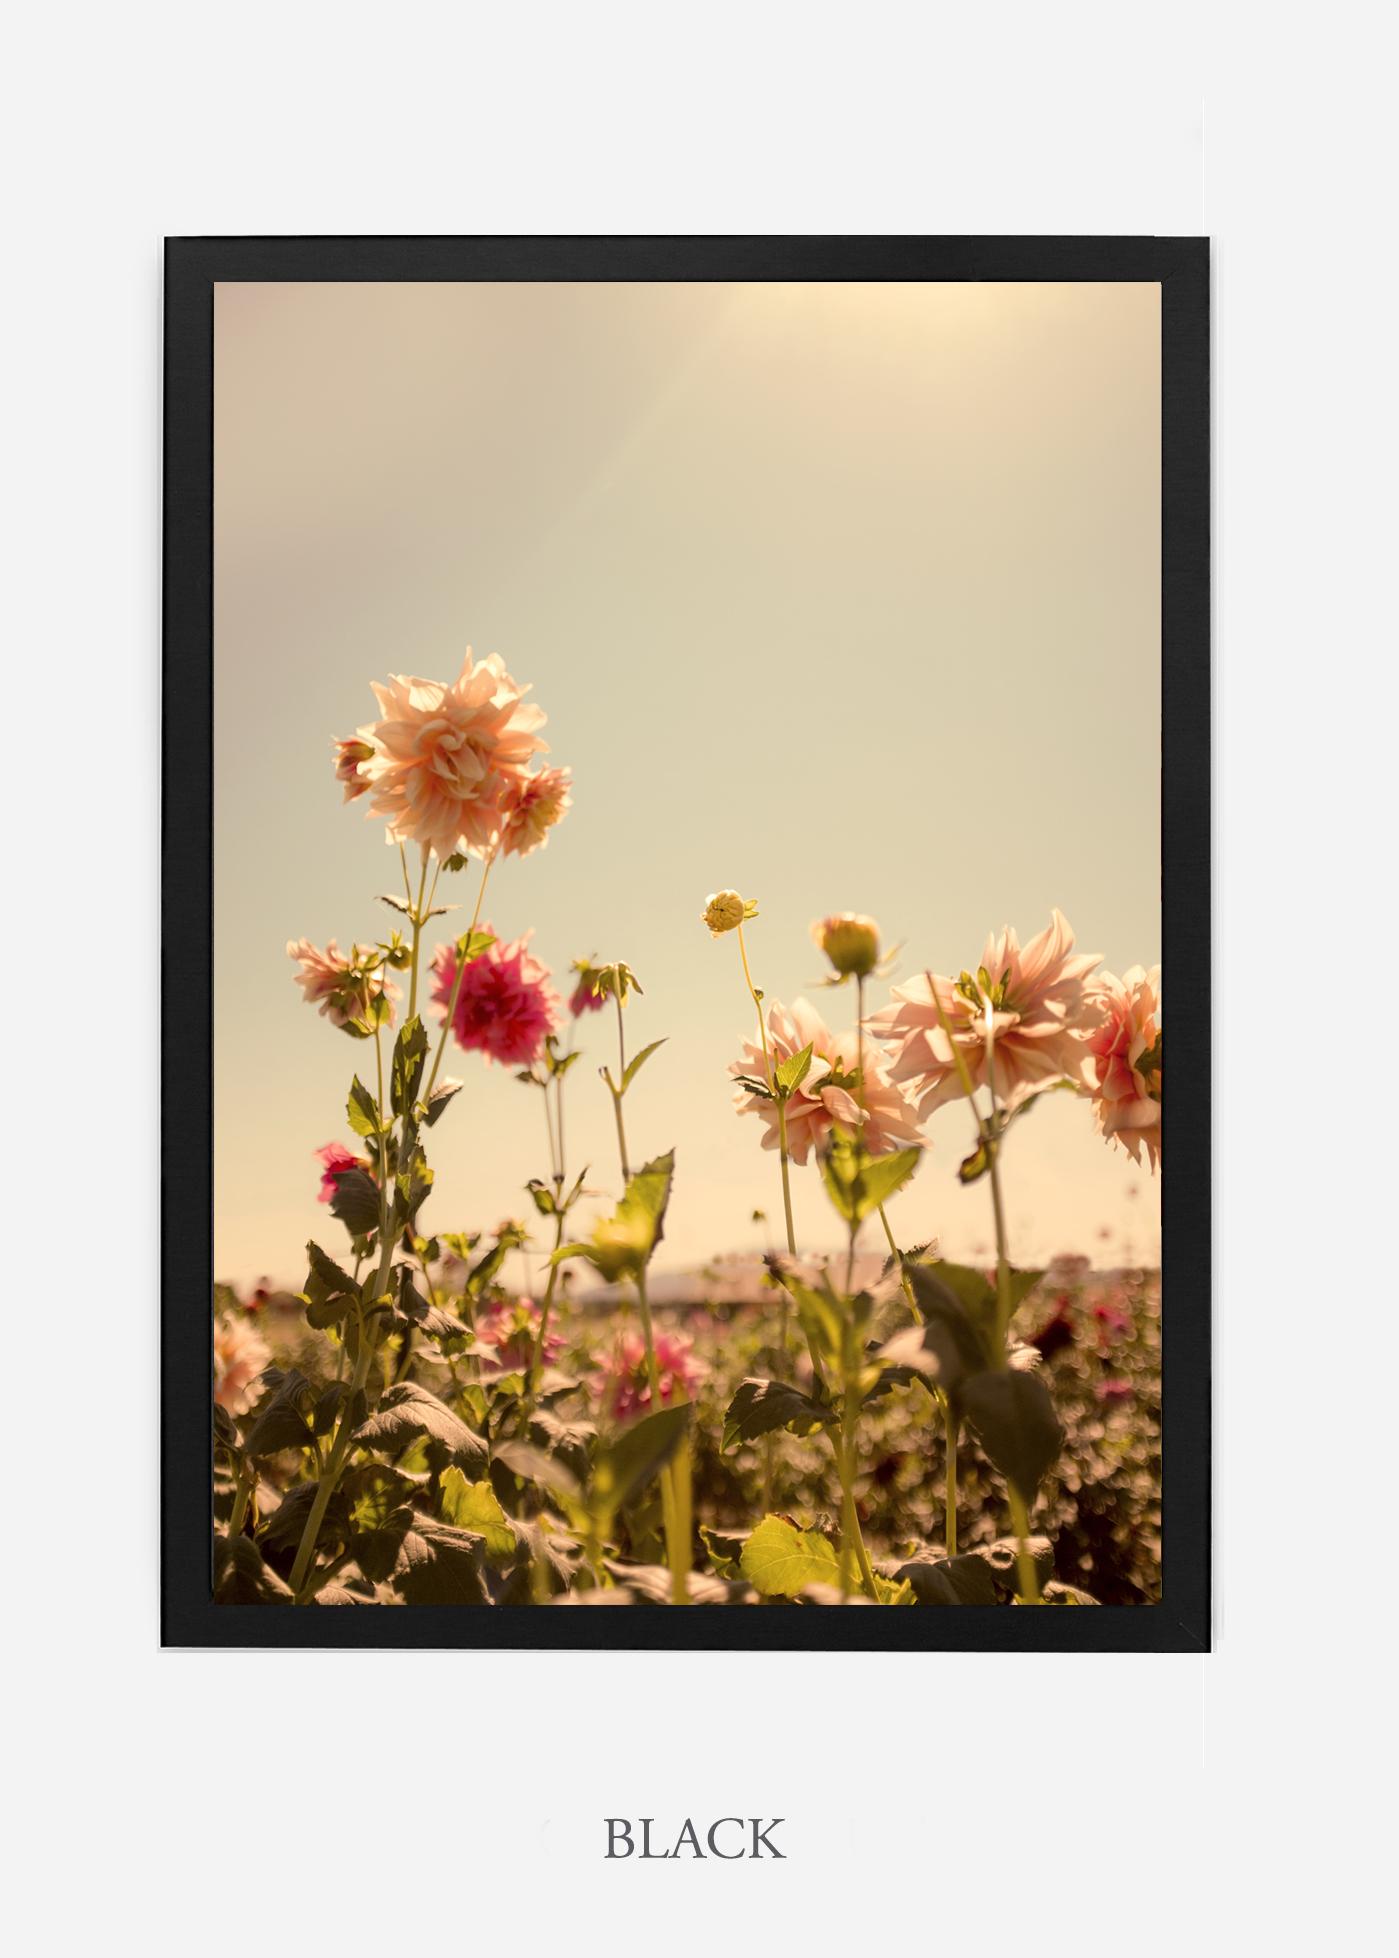 DahliaNo.3_blackframe__NoMat_interiordesign_botanicalprint_art.jpg